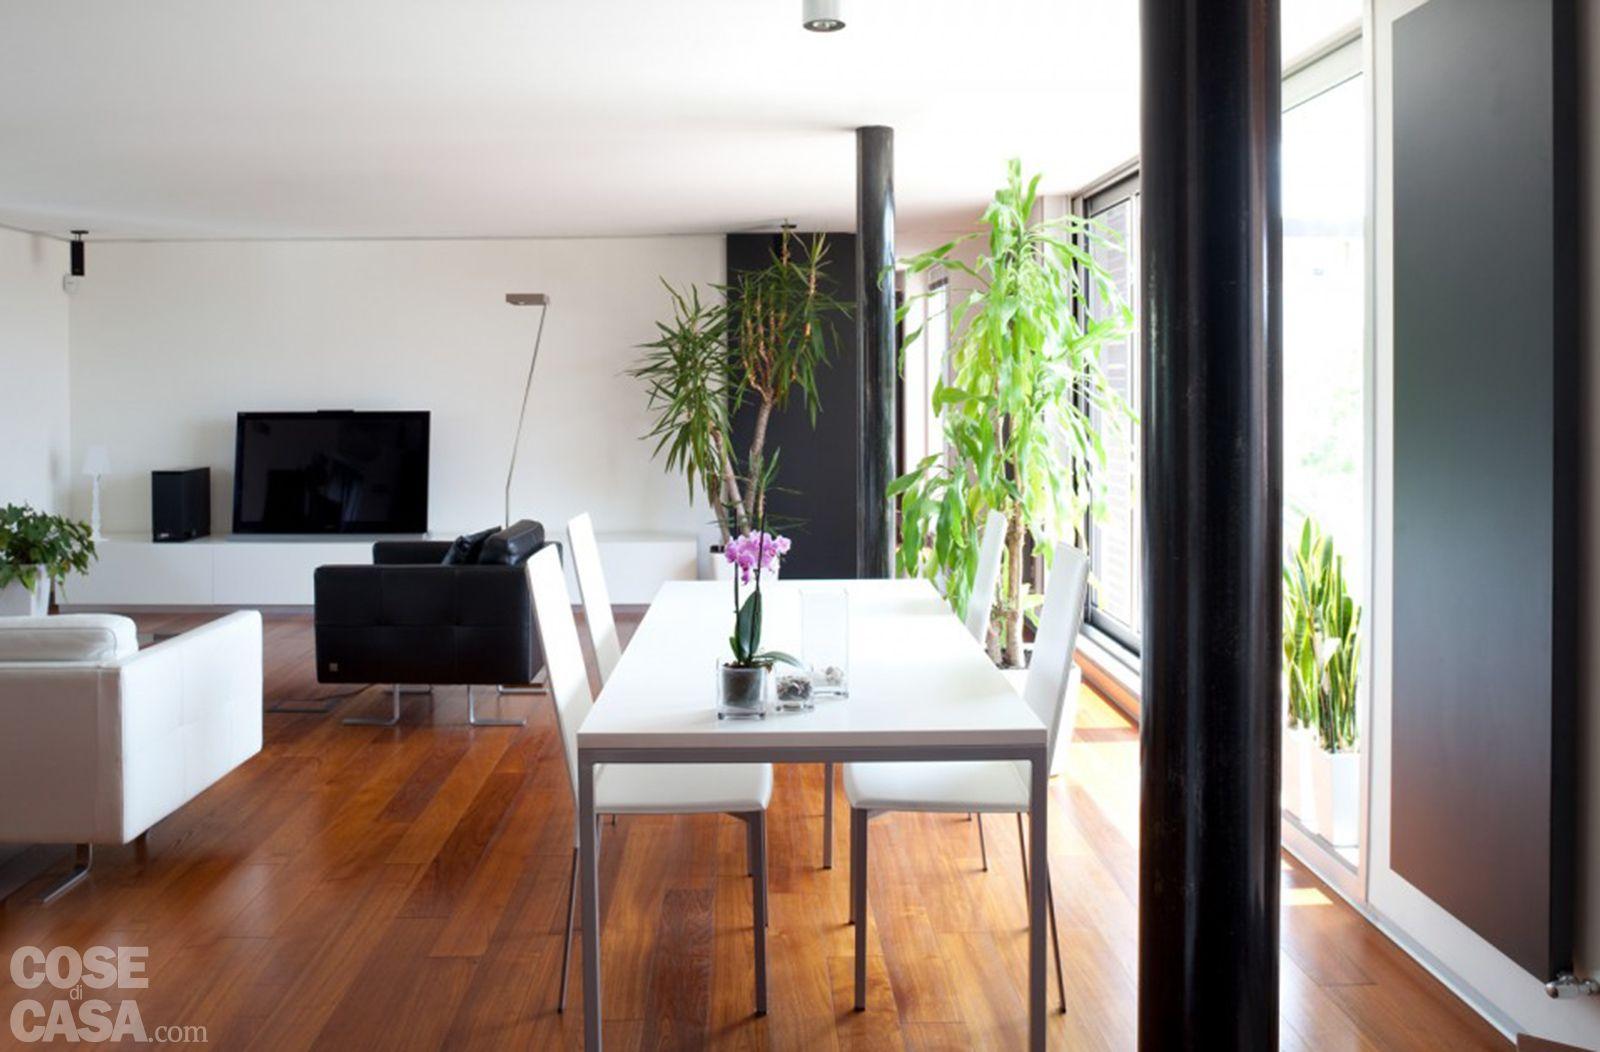 parquet in soggiorno - Cerca con Google  Wood Flooring ...